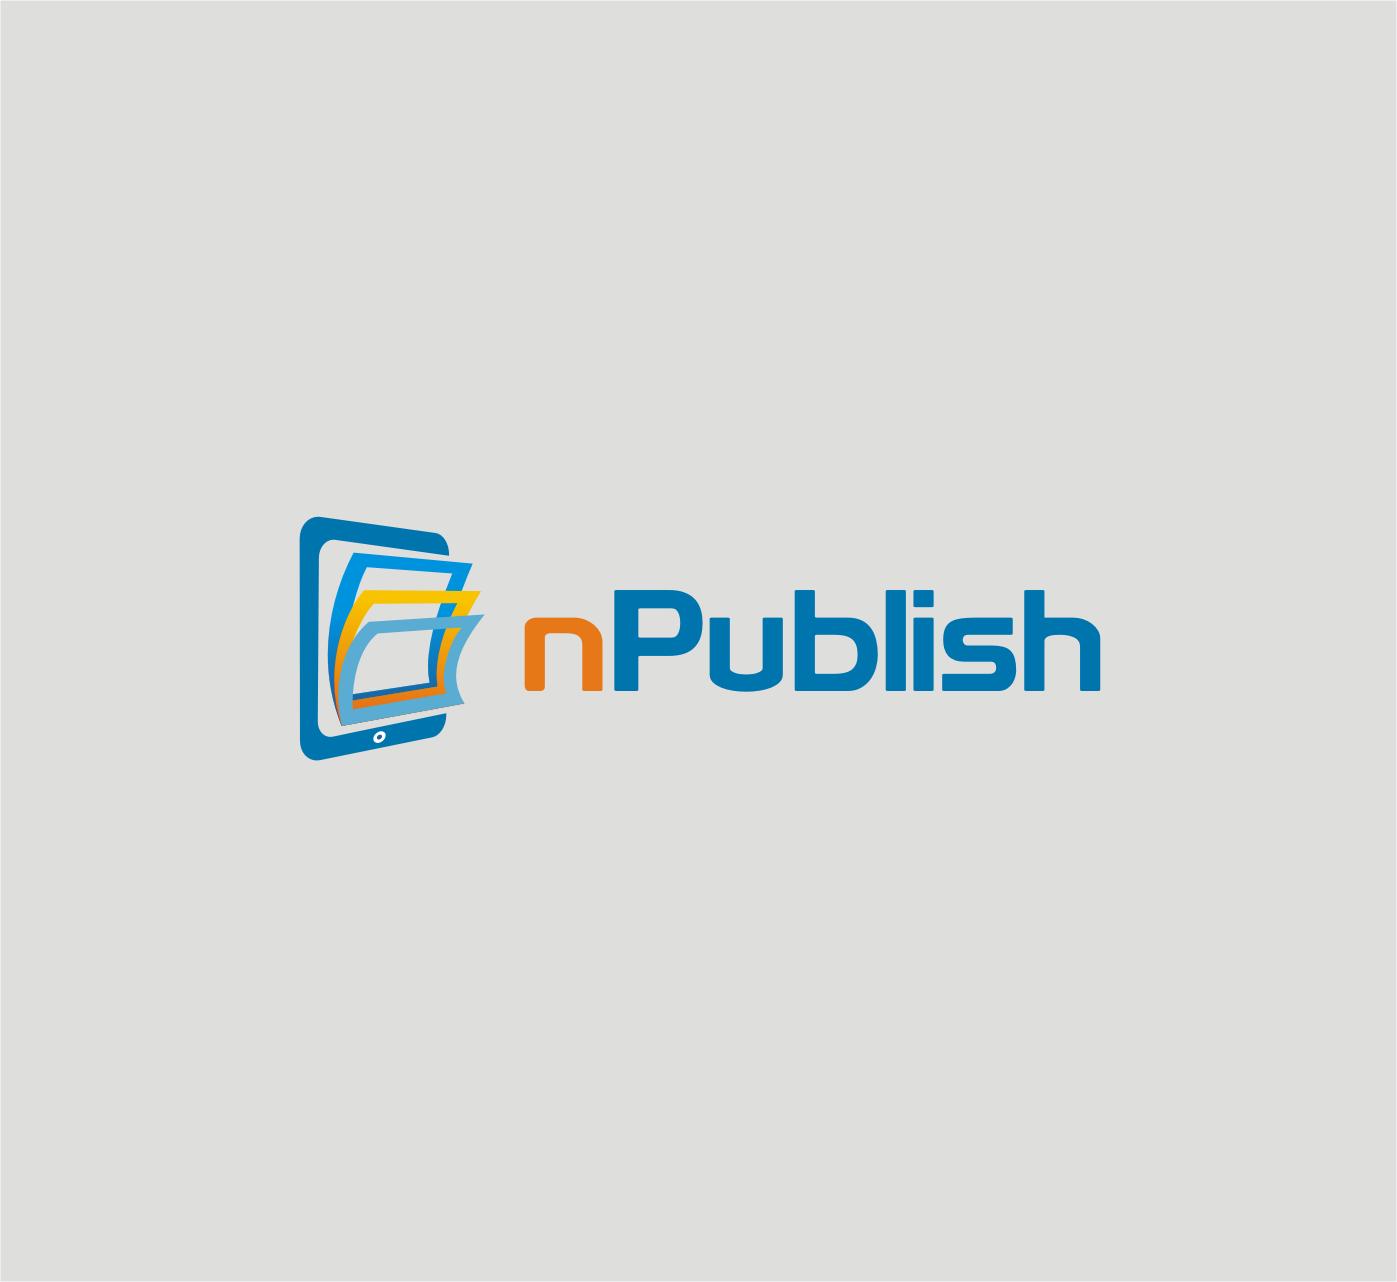 nPublish needs a new logo